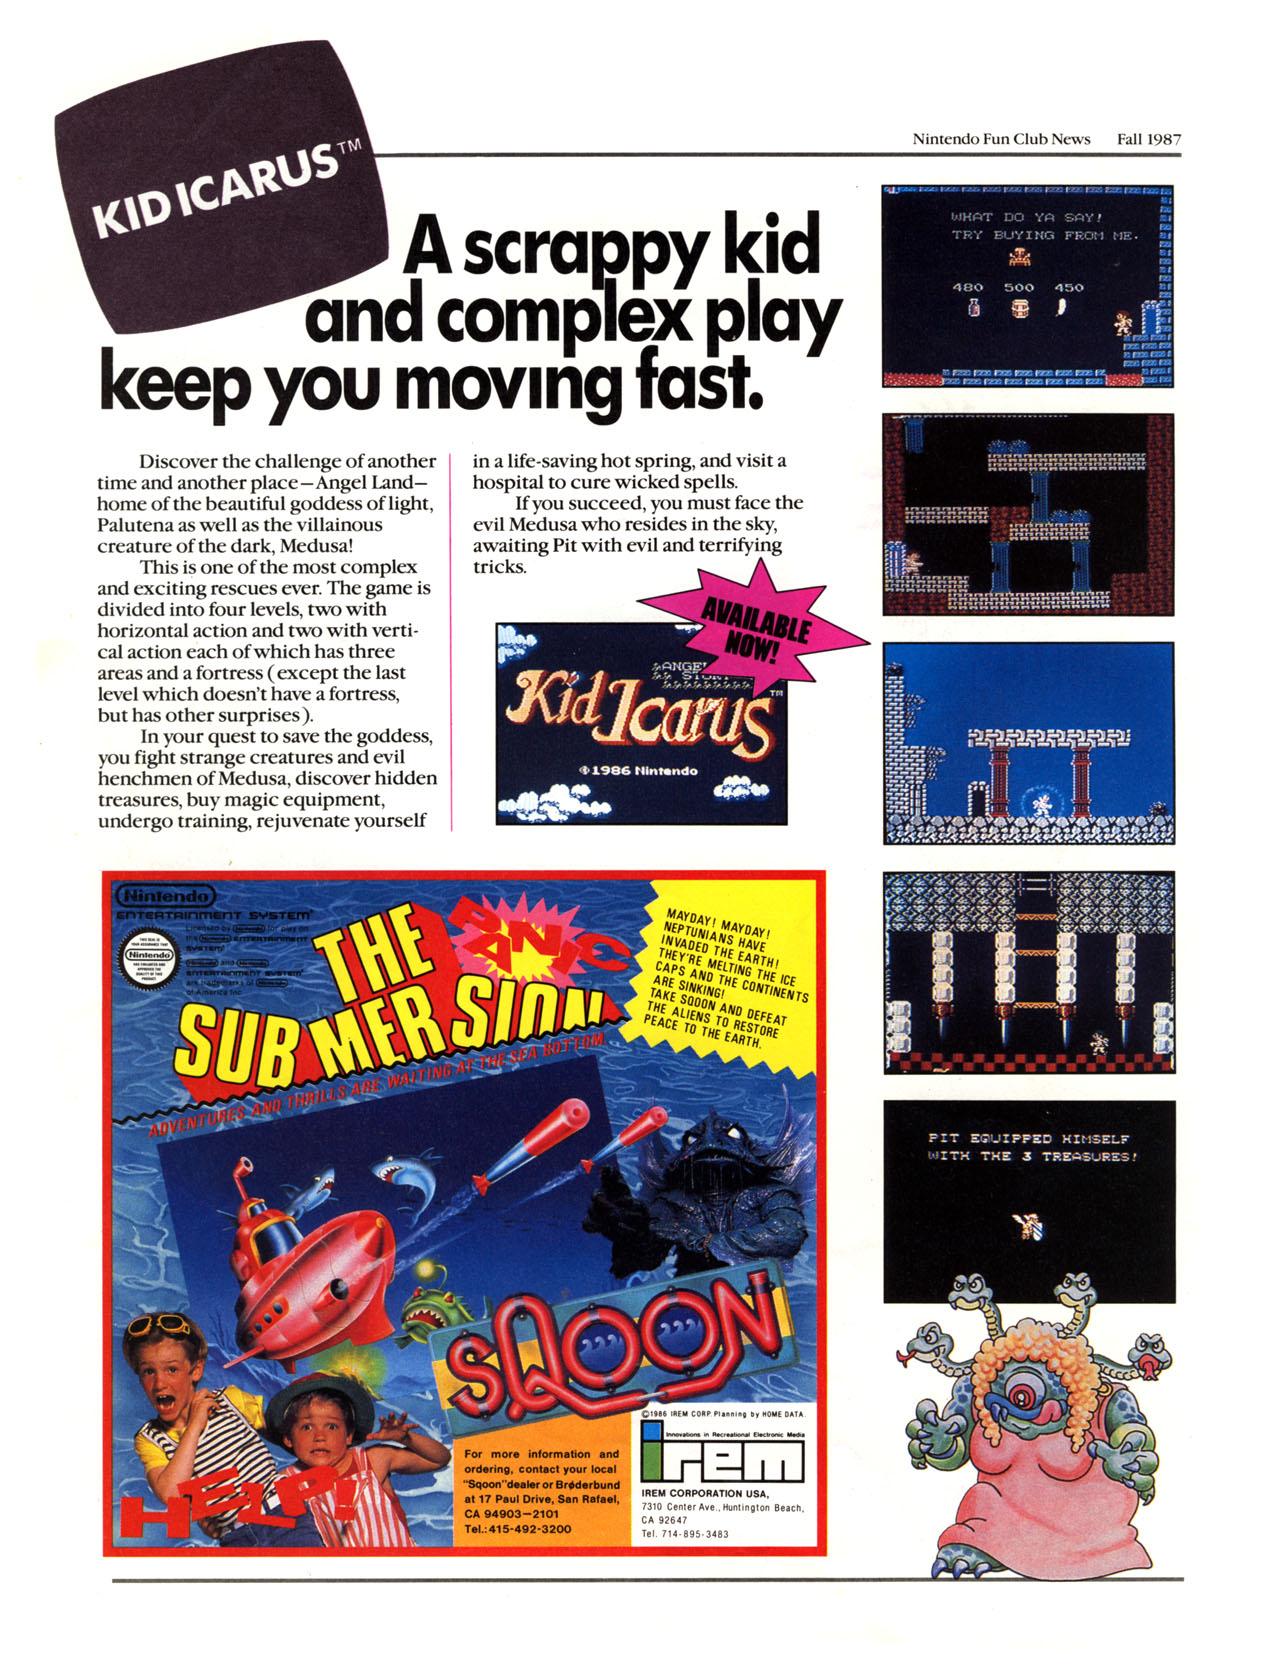 Nintendo Fun Club News - Fall 1987 - p6